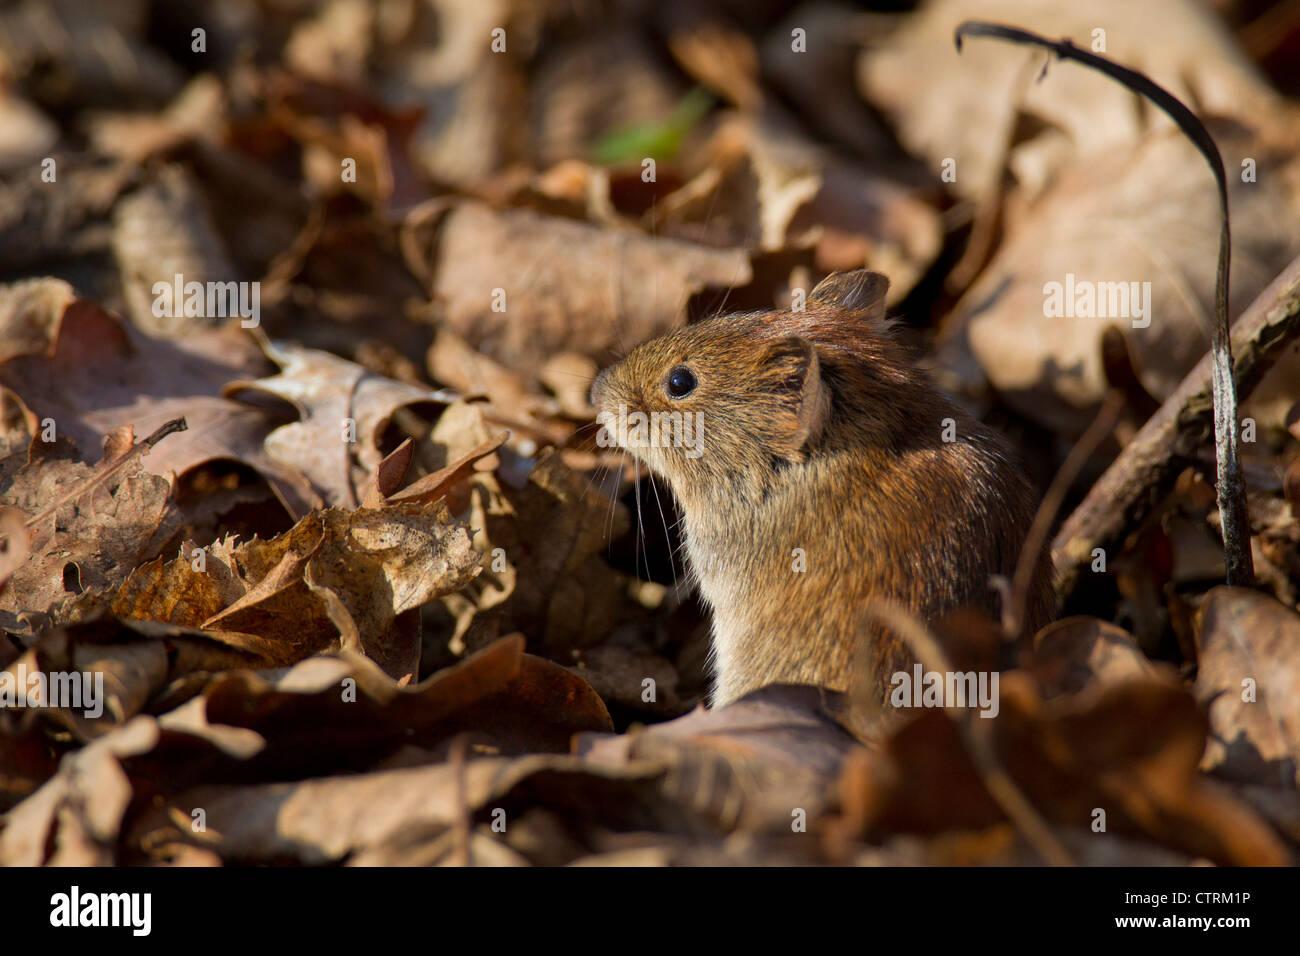 Bank vole (Myodes glareolus / Clethrionomys glareolus) sitting camouflaged among dead leaves on the forest floor, - Stock Image